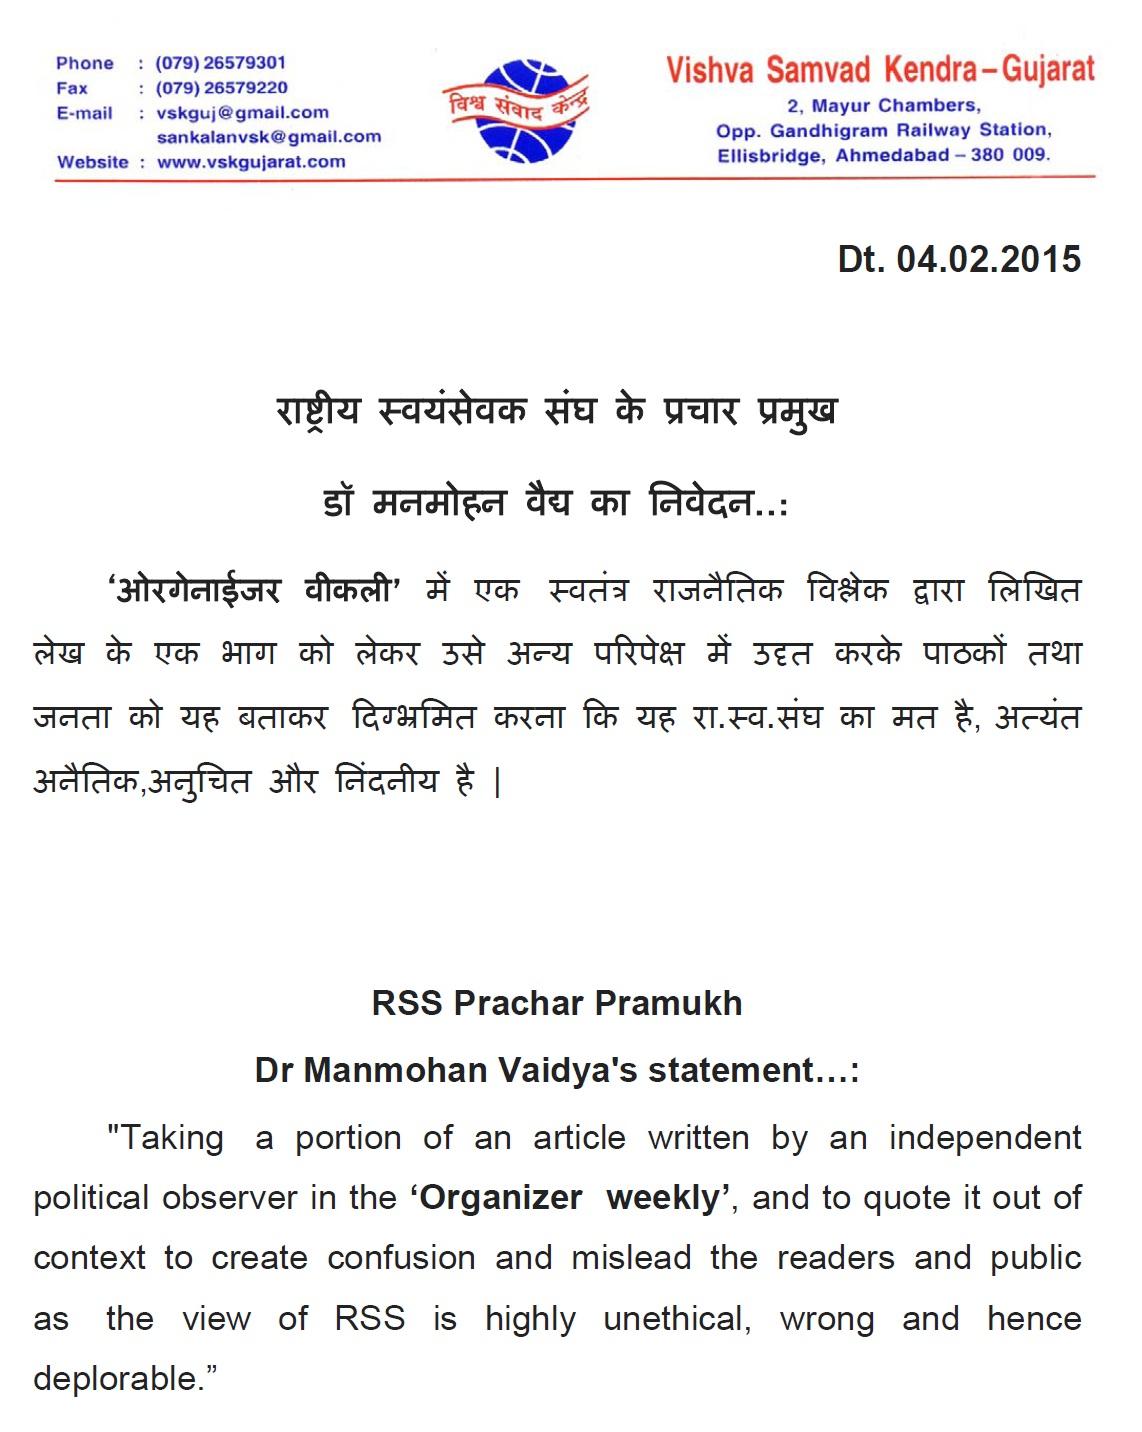 STATEMENT by Dr Manmohan Vaidya Feb-4-2015